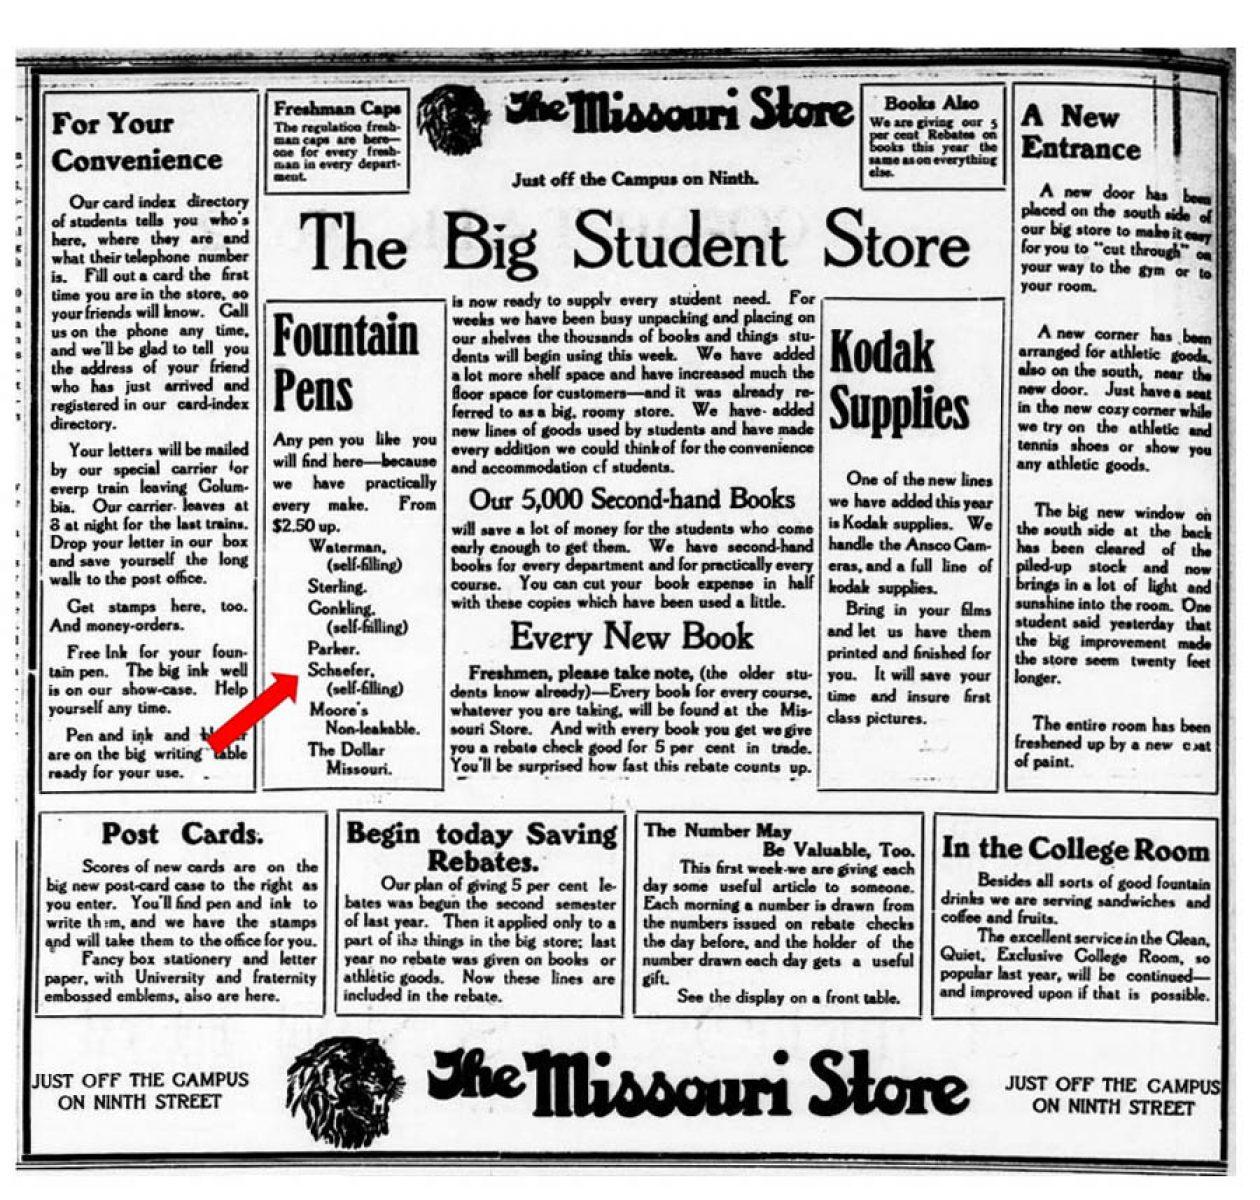 1912 09 17 University Missourian anuncio completo